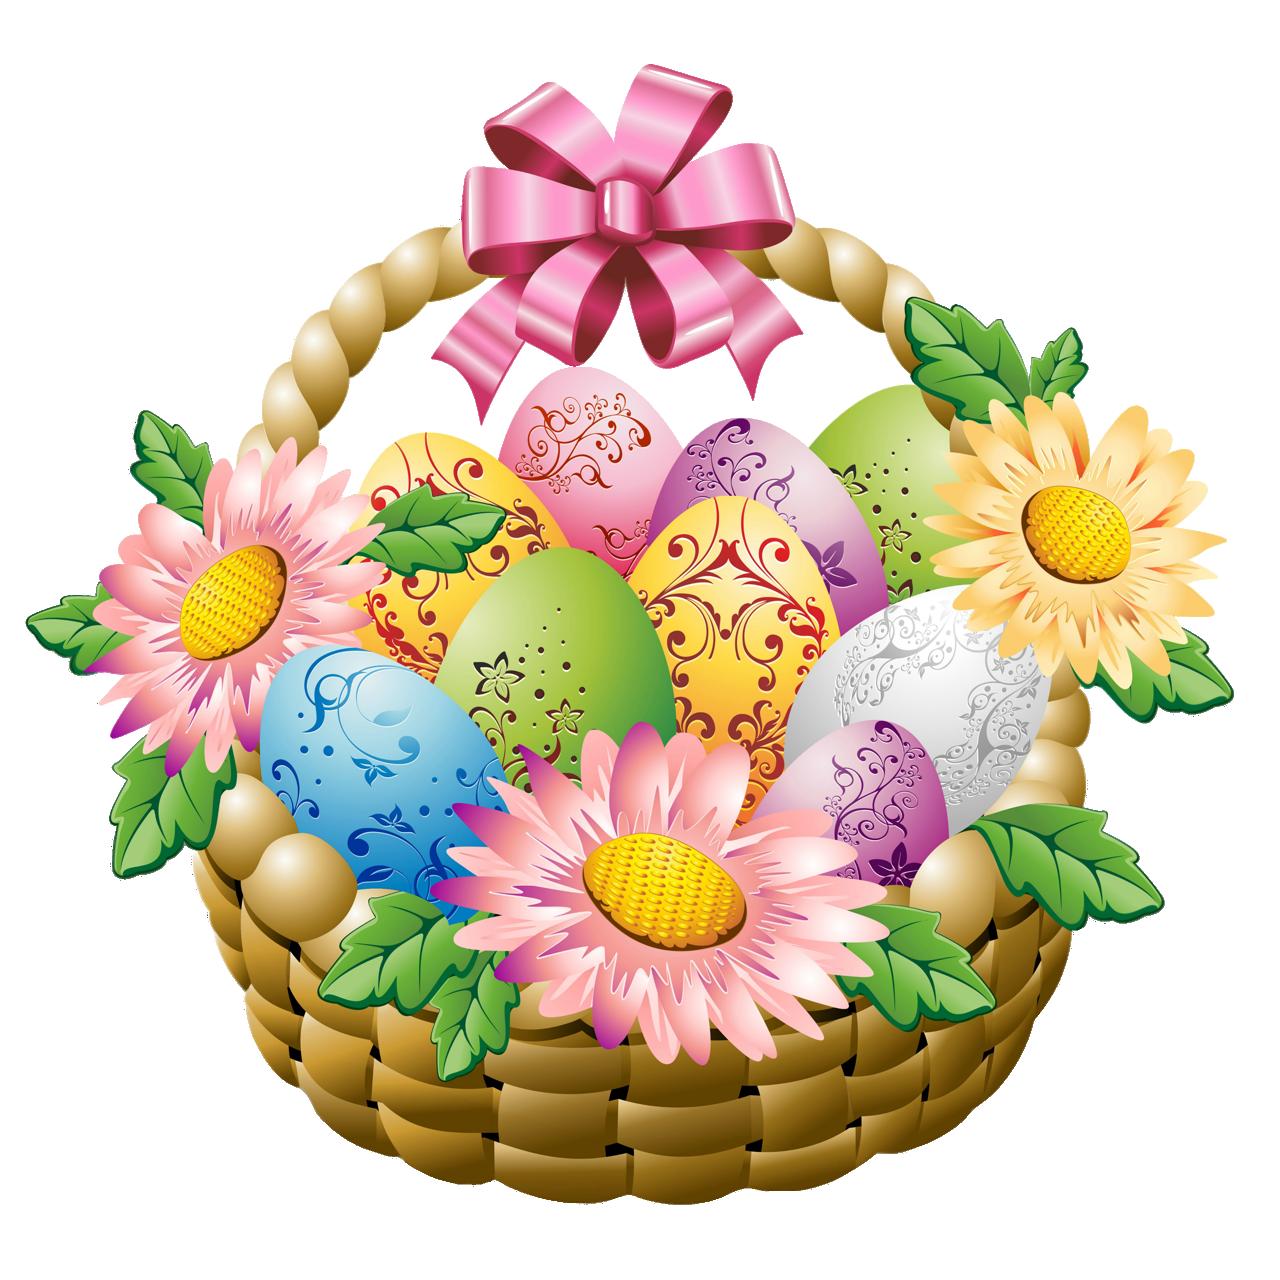 Free easter basket clipart jpg black and white download Free Easter Basket Clipart at GetDrawings.com | Free for personal ... jpg black and white download